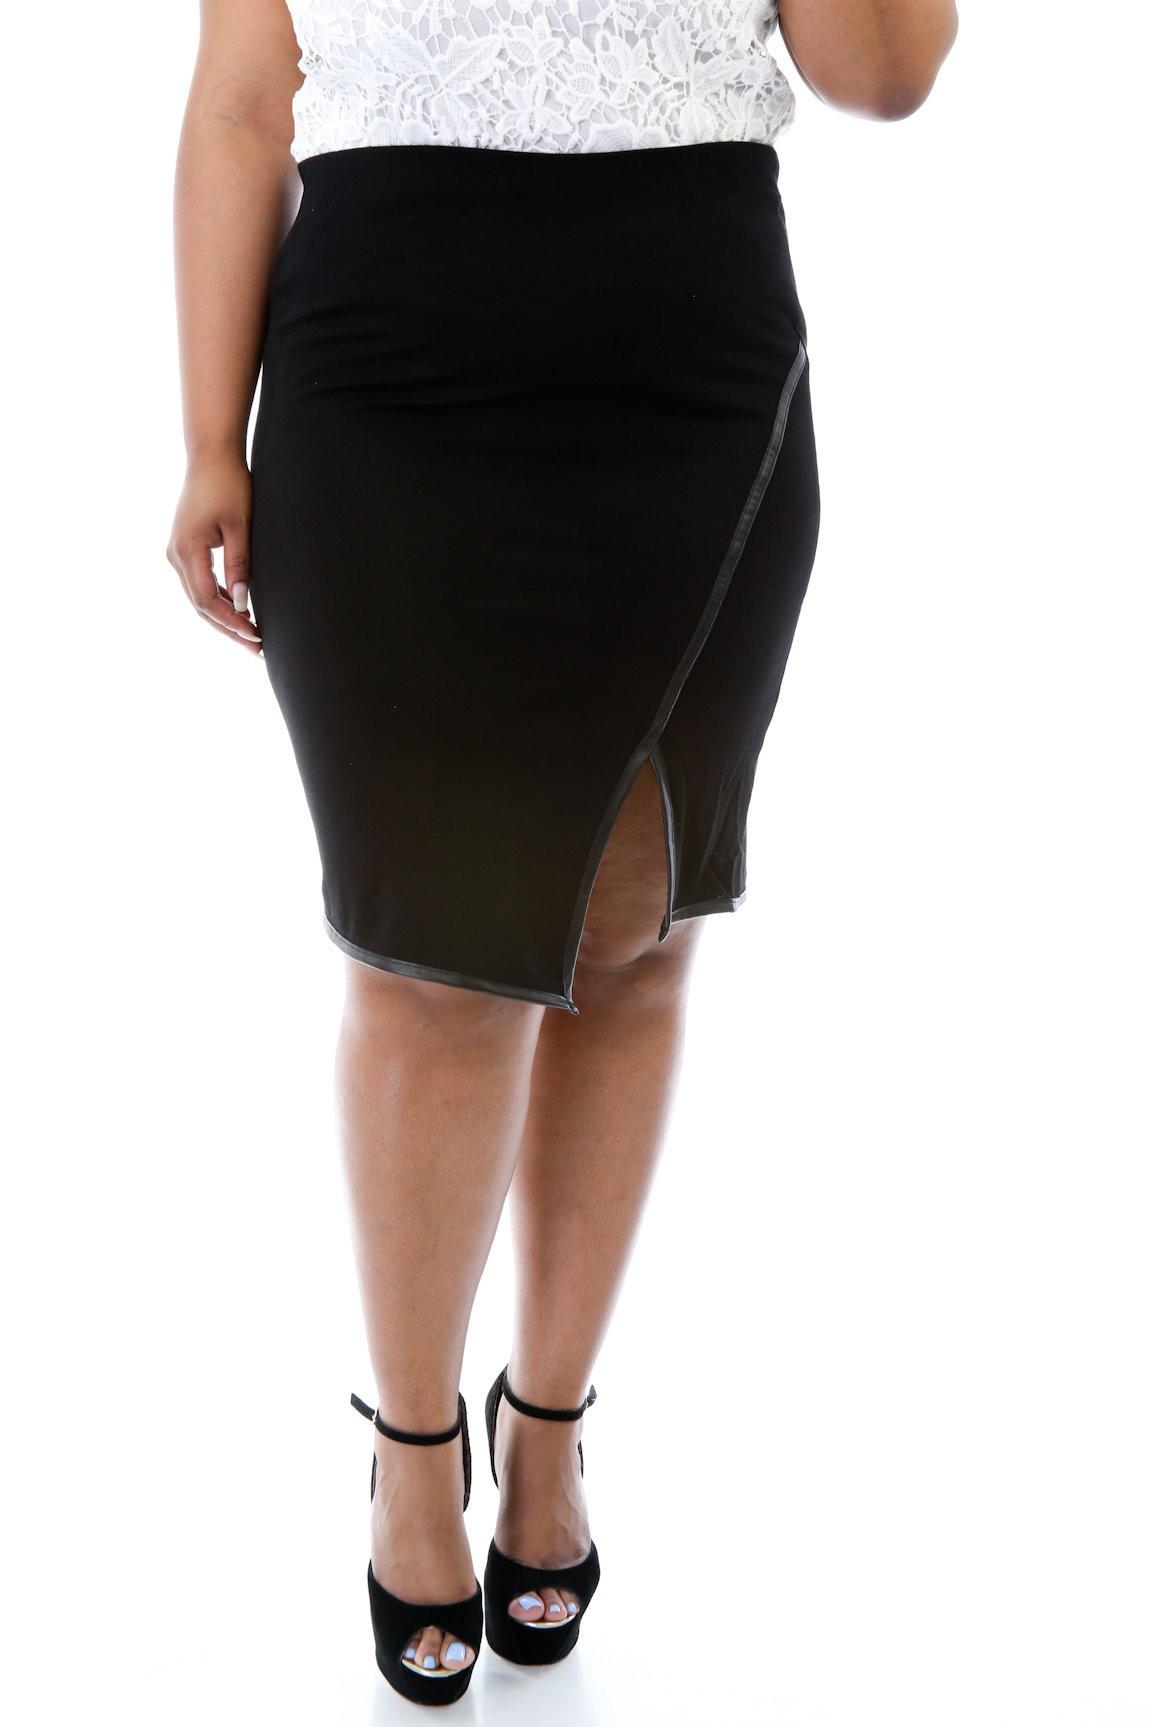 Raw Curve Skirt